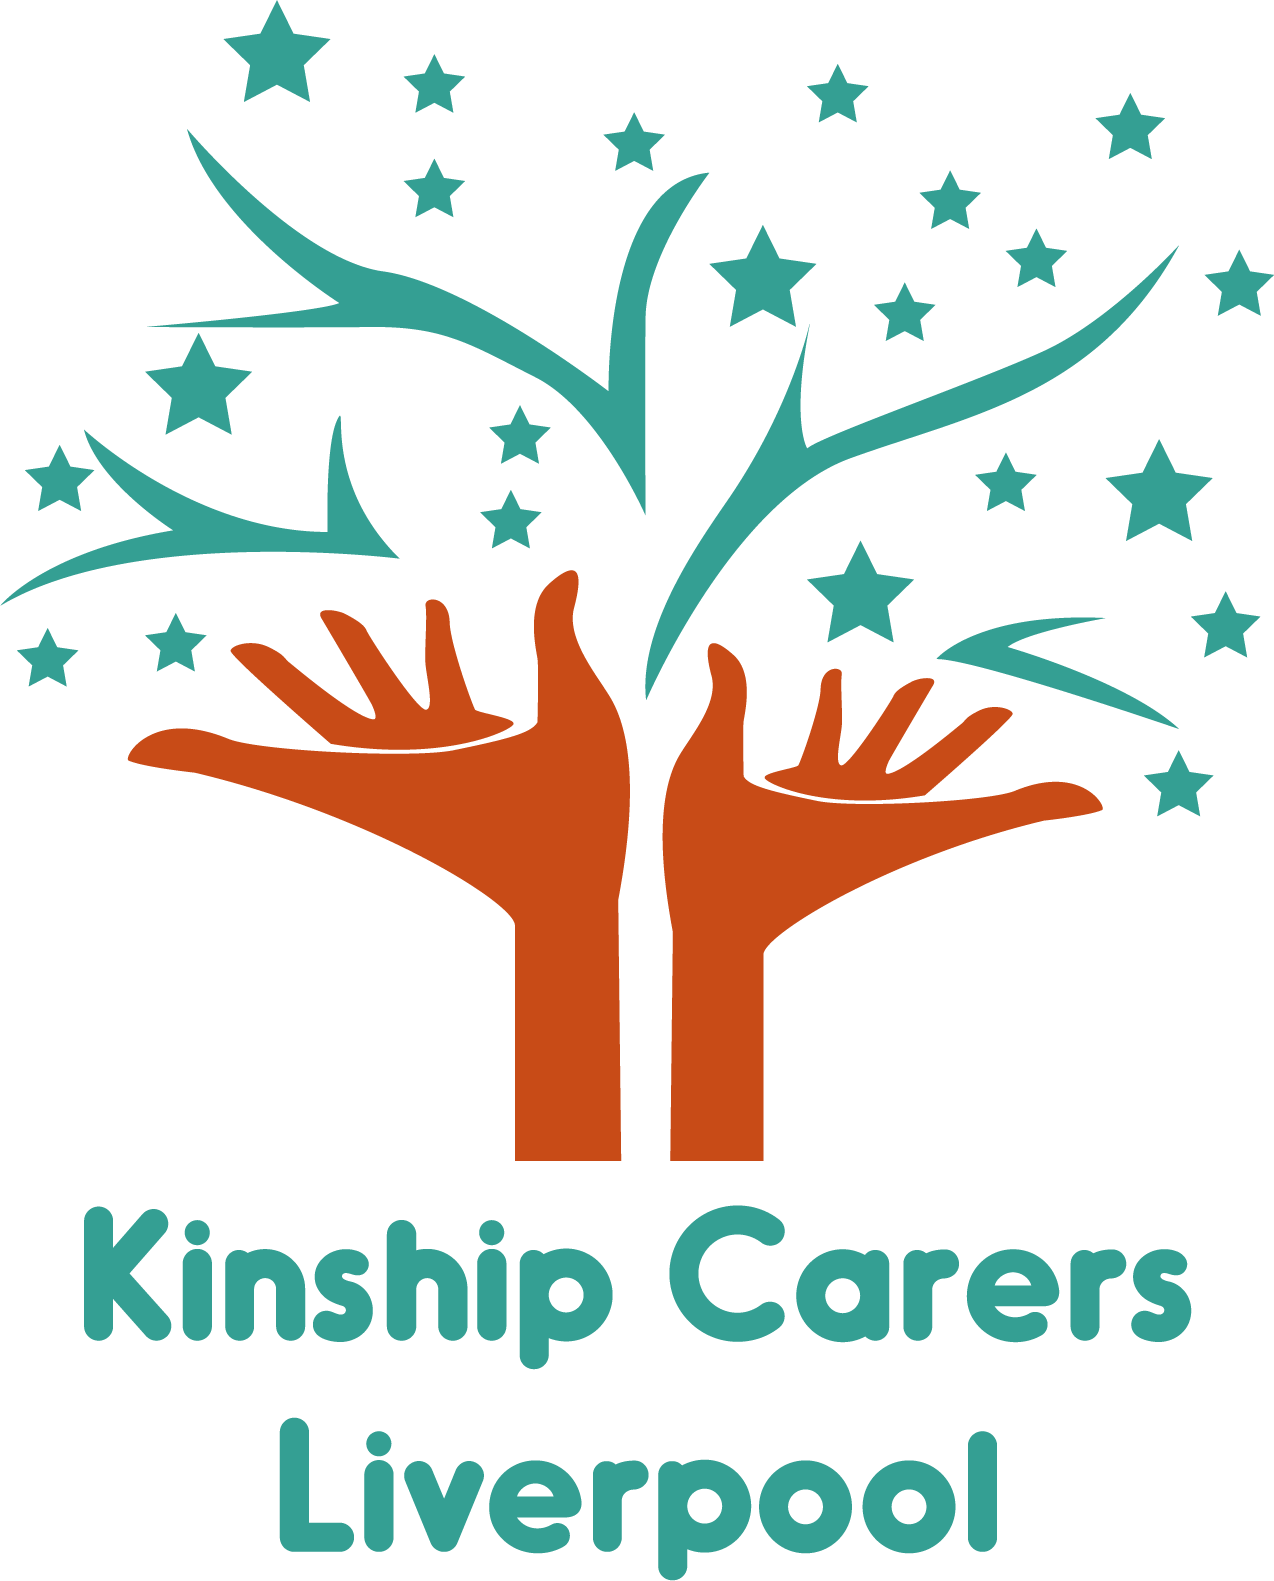 Kinship Carers